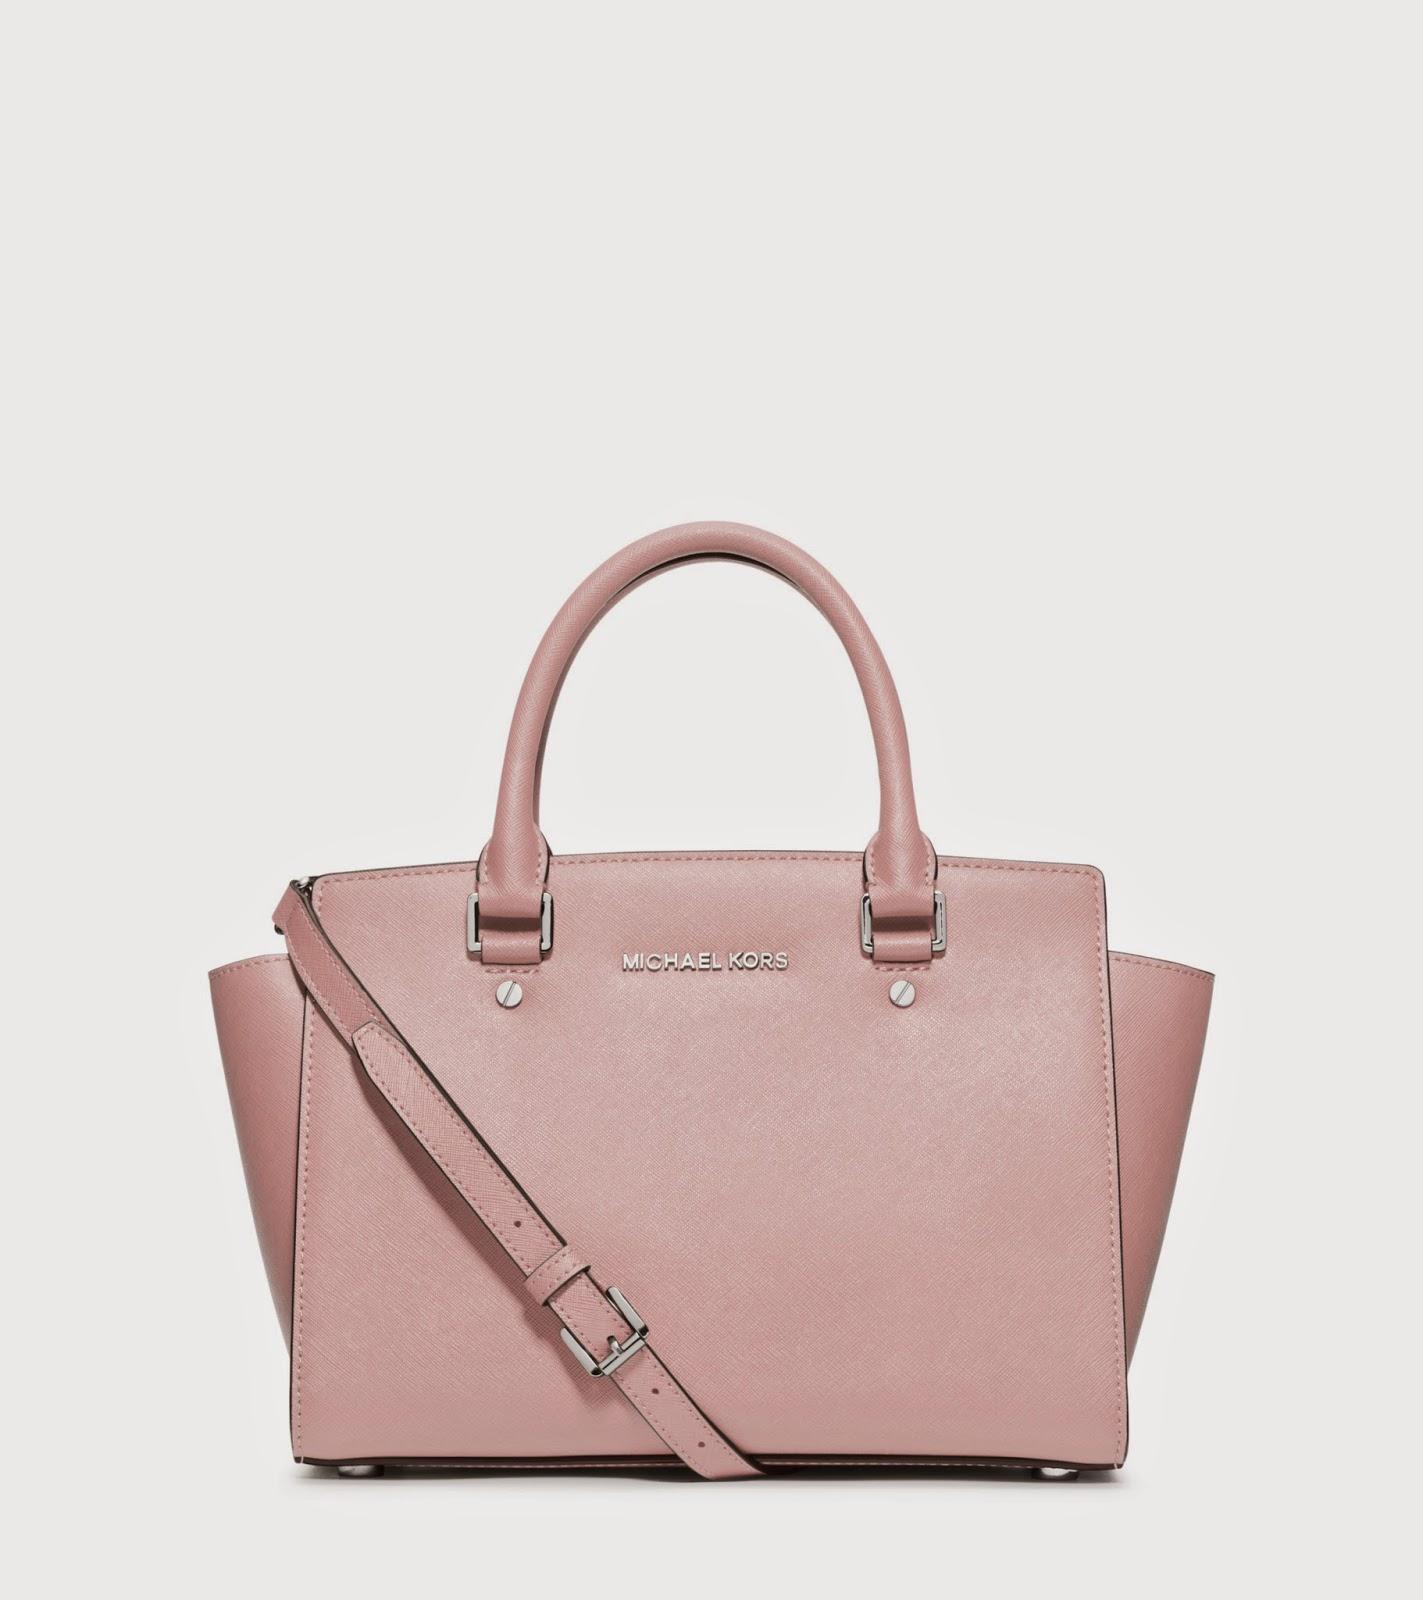 Michael kors handbags dubai mall michael kors to open selma centric pop up shop in dubai